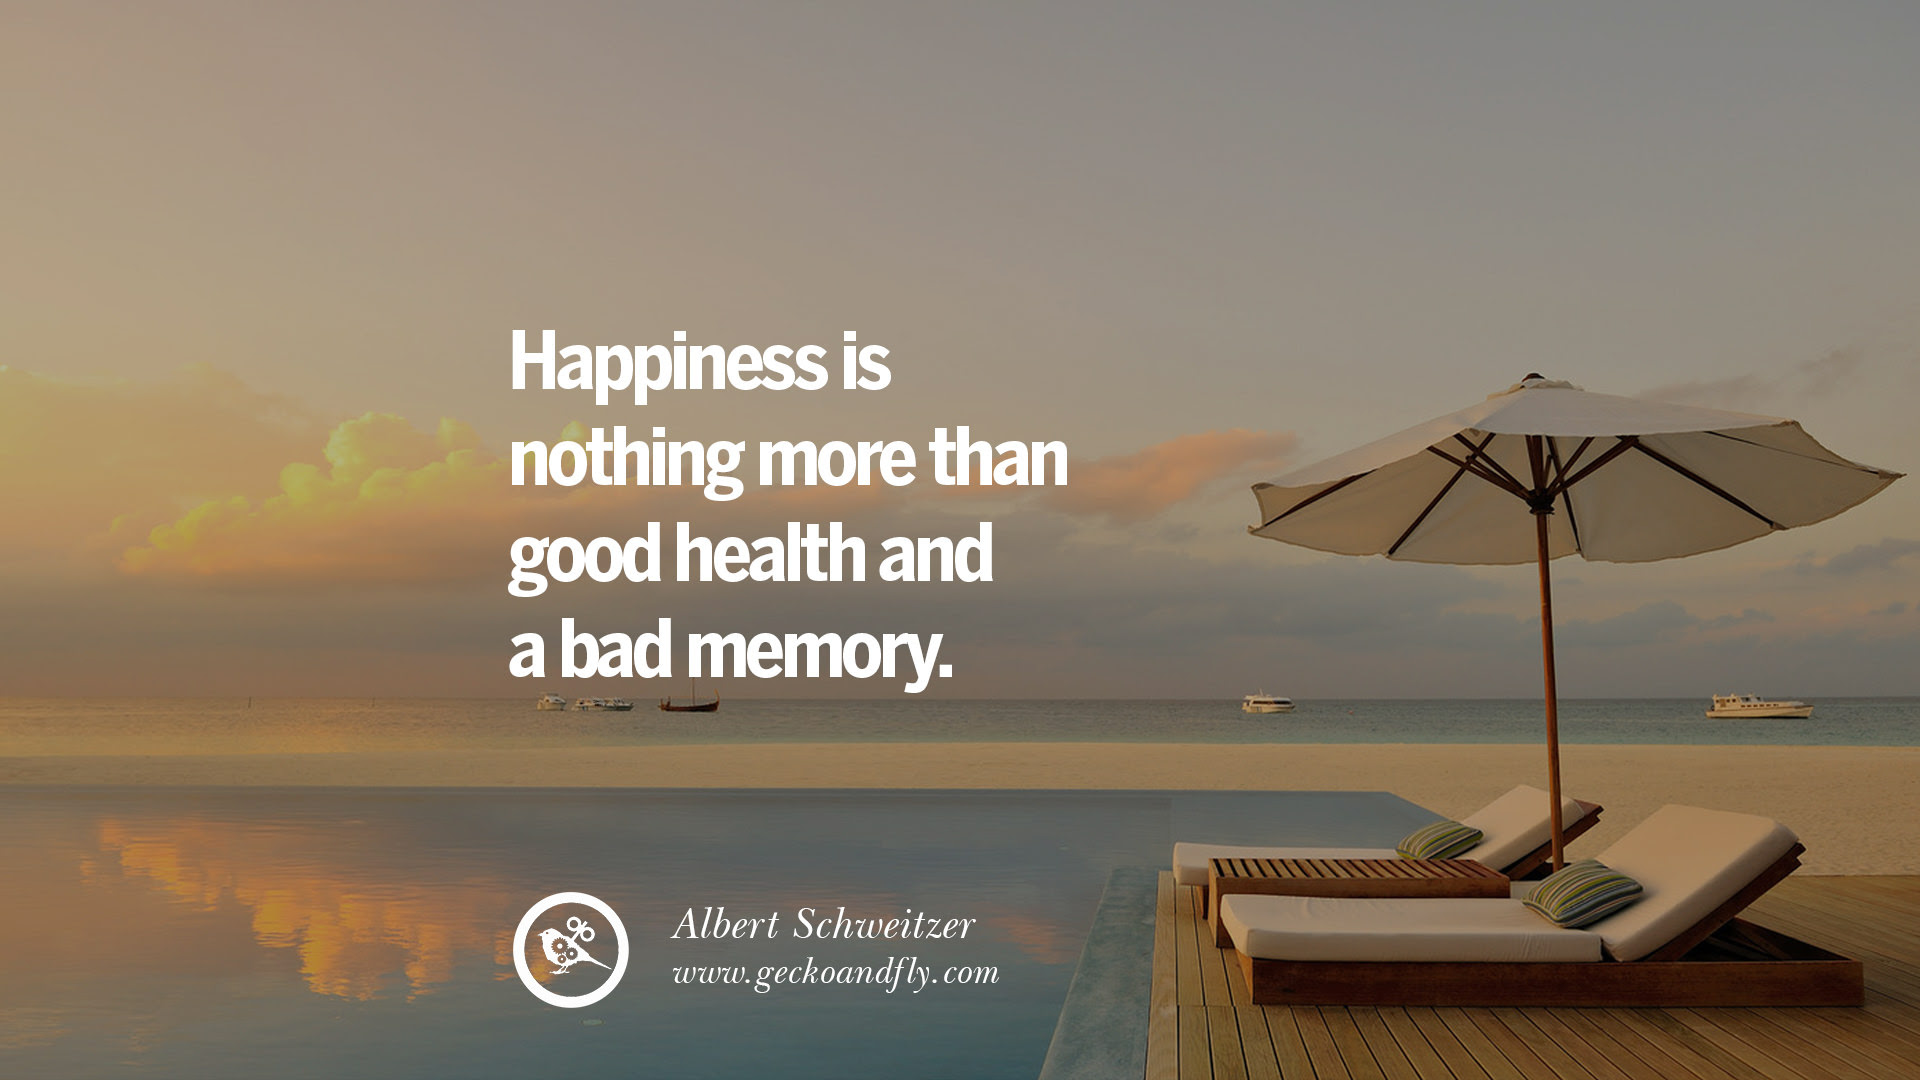 Pursuit Of Happiness Quotes. QuotesGram